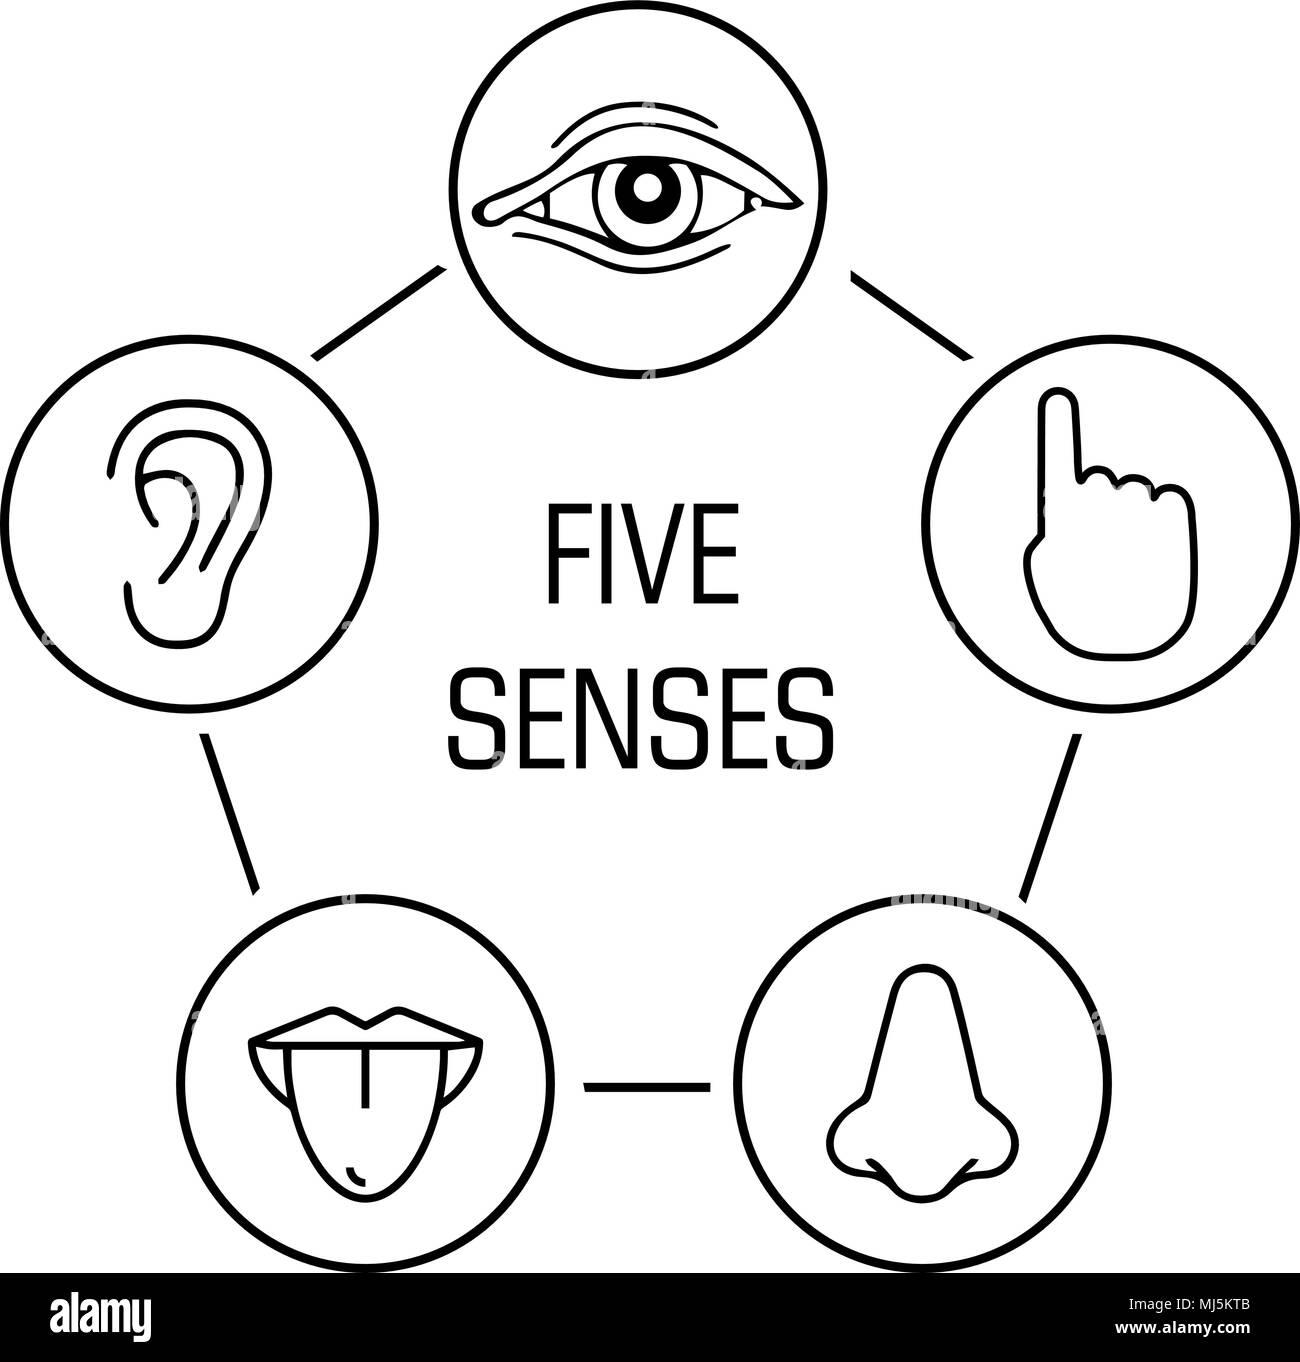 Five Senses Illustration Stock Photos Amp Five Senses